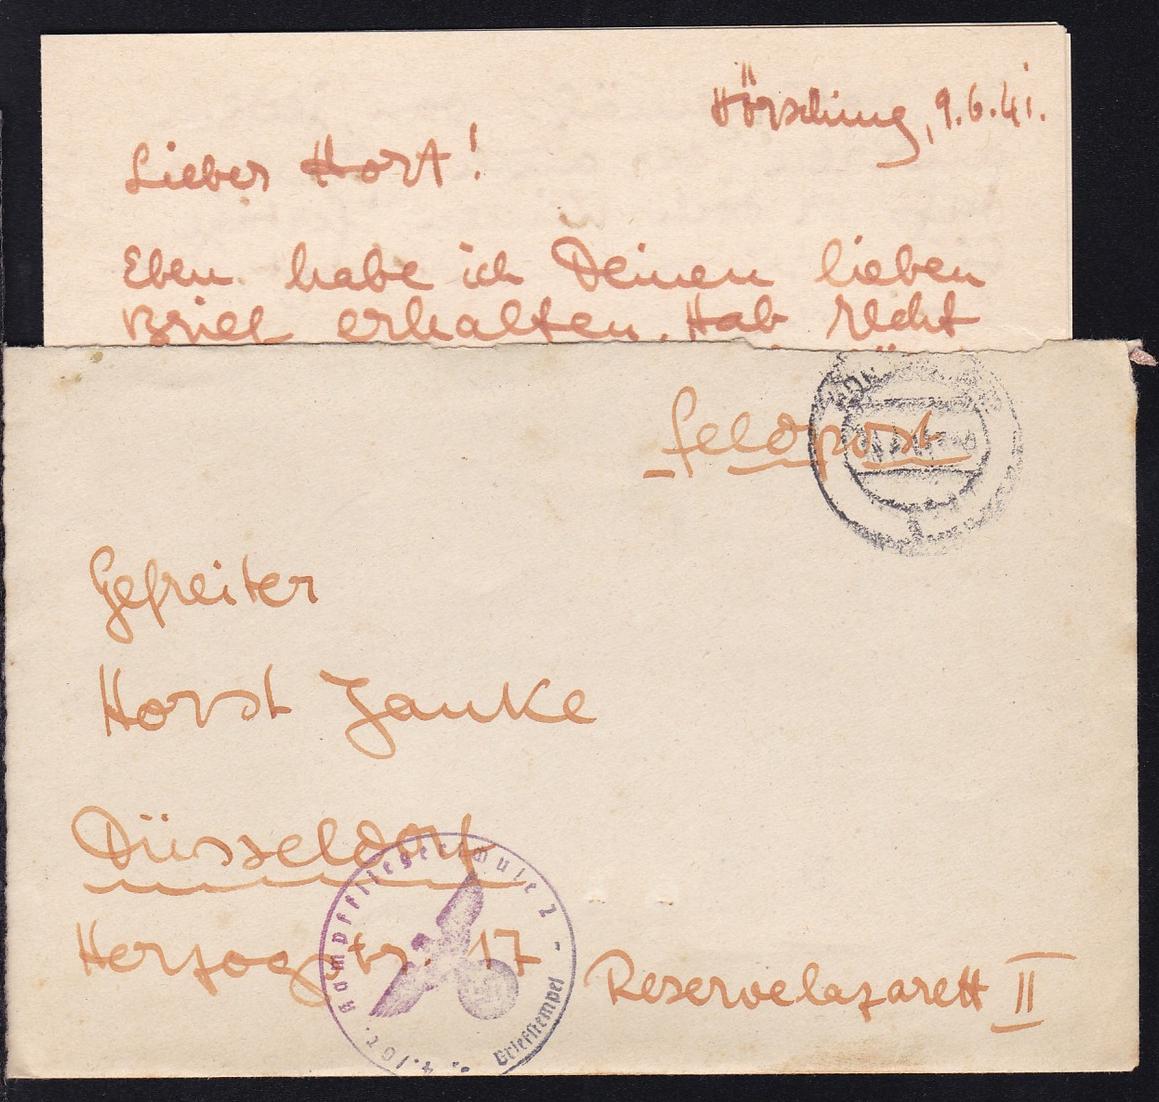 1941 OSt. Hörsching und K1 4./Gr. Kampffliegerschule 2 Briefstempel auf 0